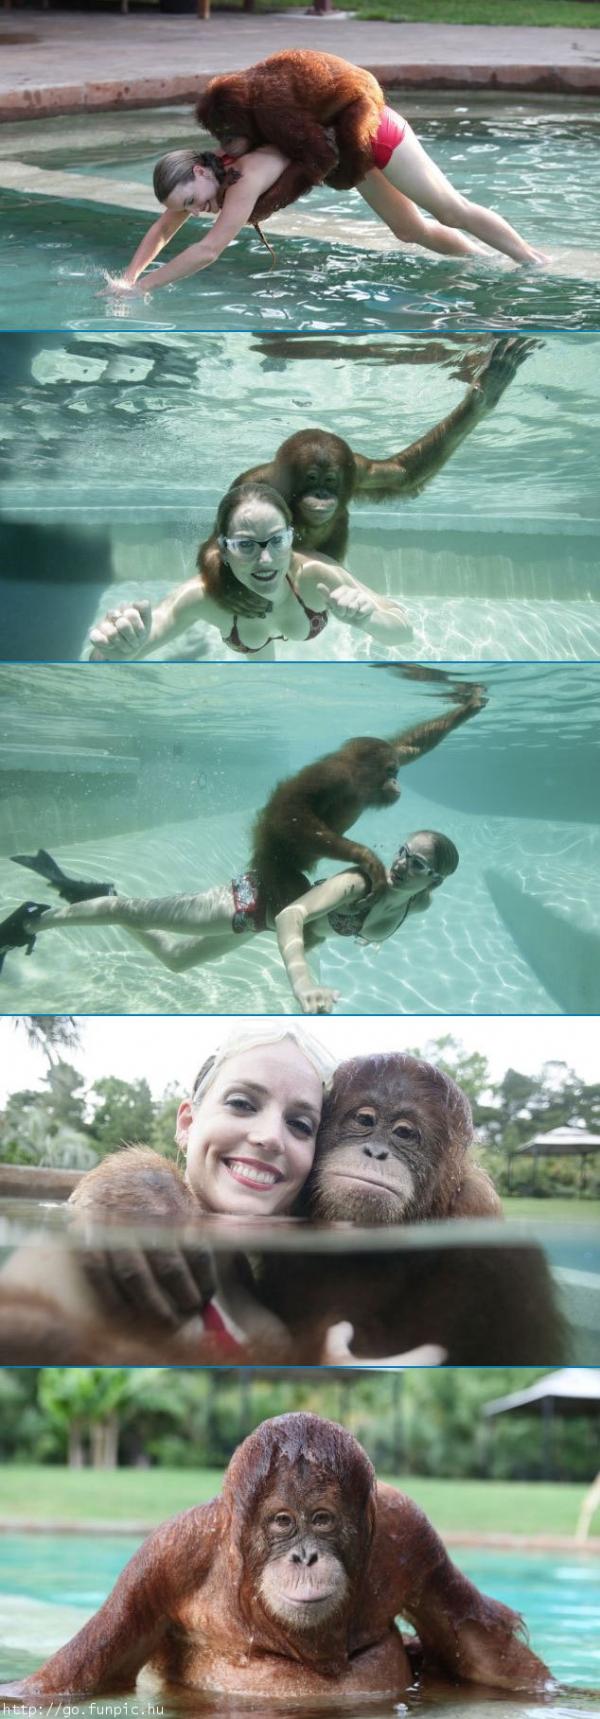 imagenes humor internet orangutan nada